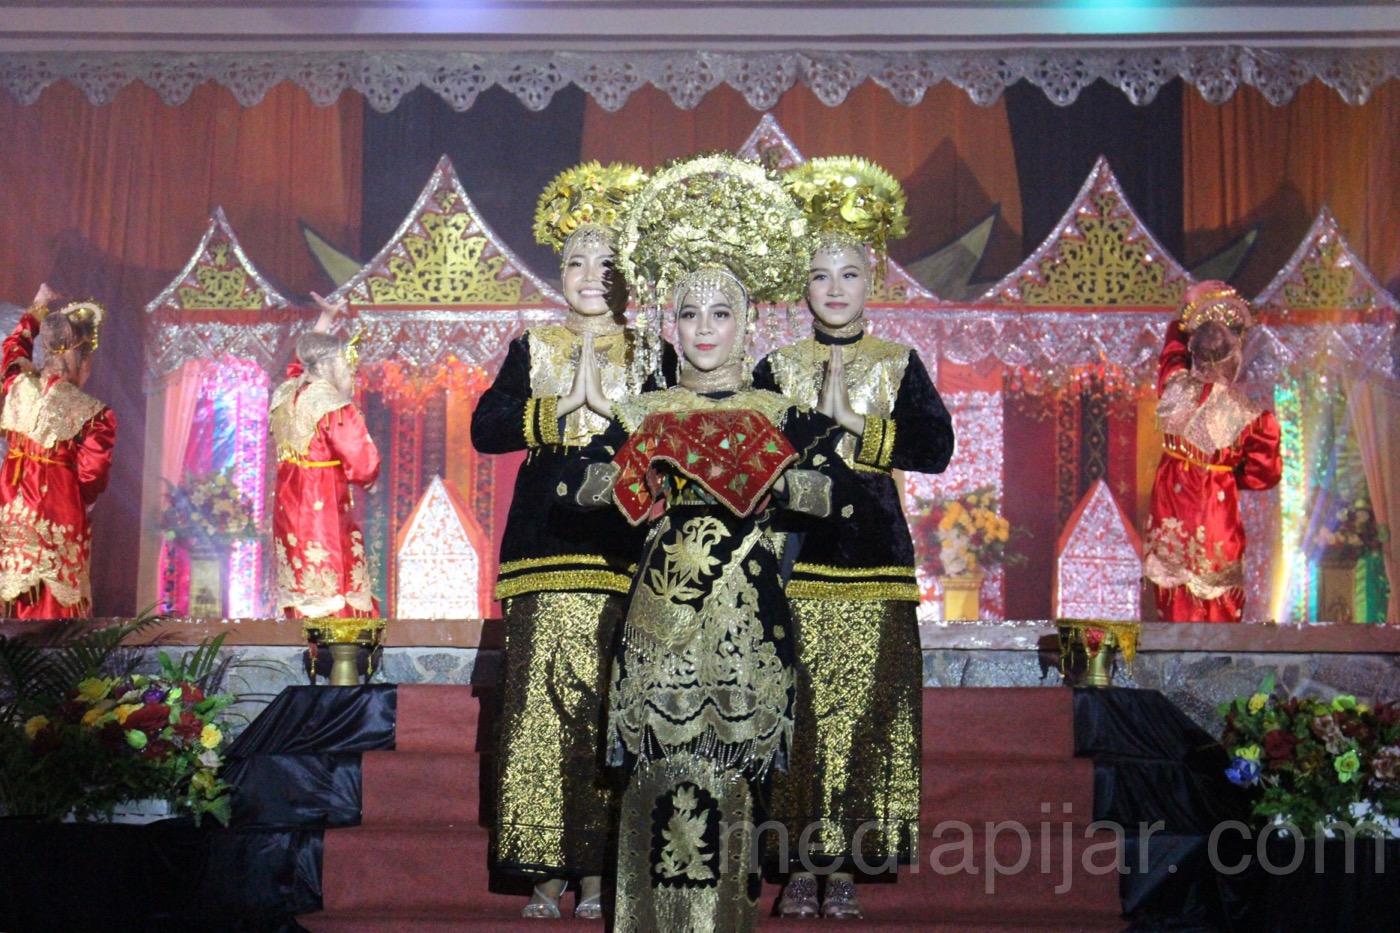 Tari Persembahan sebagai sajian pembuka dalam acara Pagelaran Budaya Minangkabau, Ikatan Mahasiswa Imam Bonjol (IMIB) di Gelanggang Mahasiswa Universitas Sumatera utara (USU). (27/4) (Fotografer: Frans Dicky Naibaho)